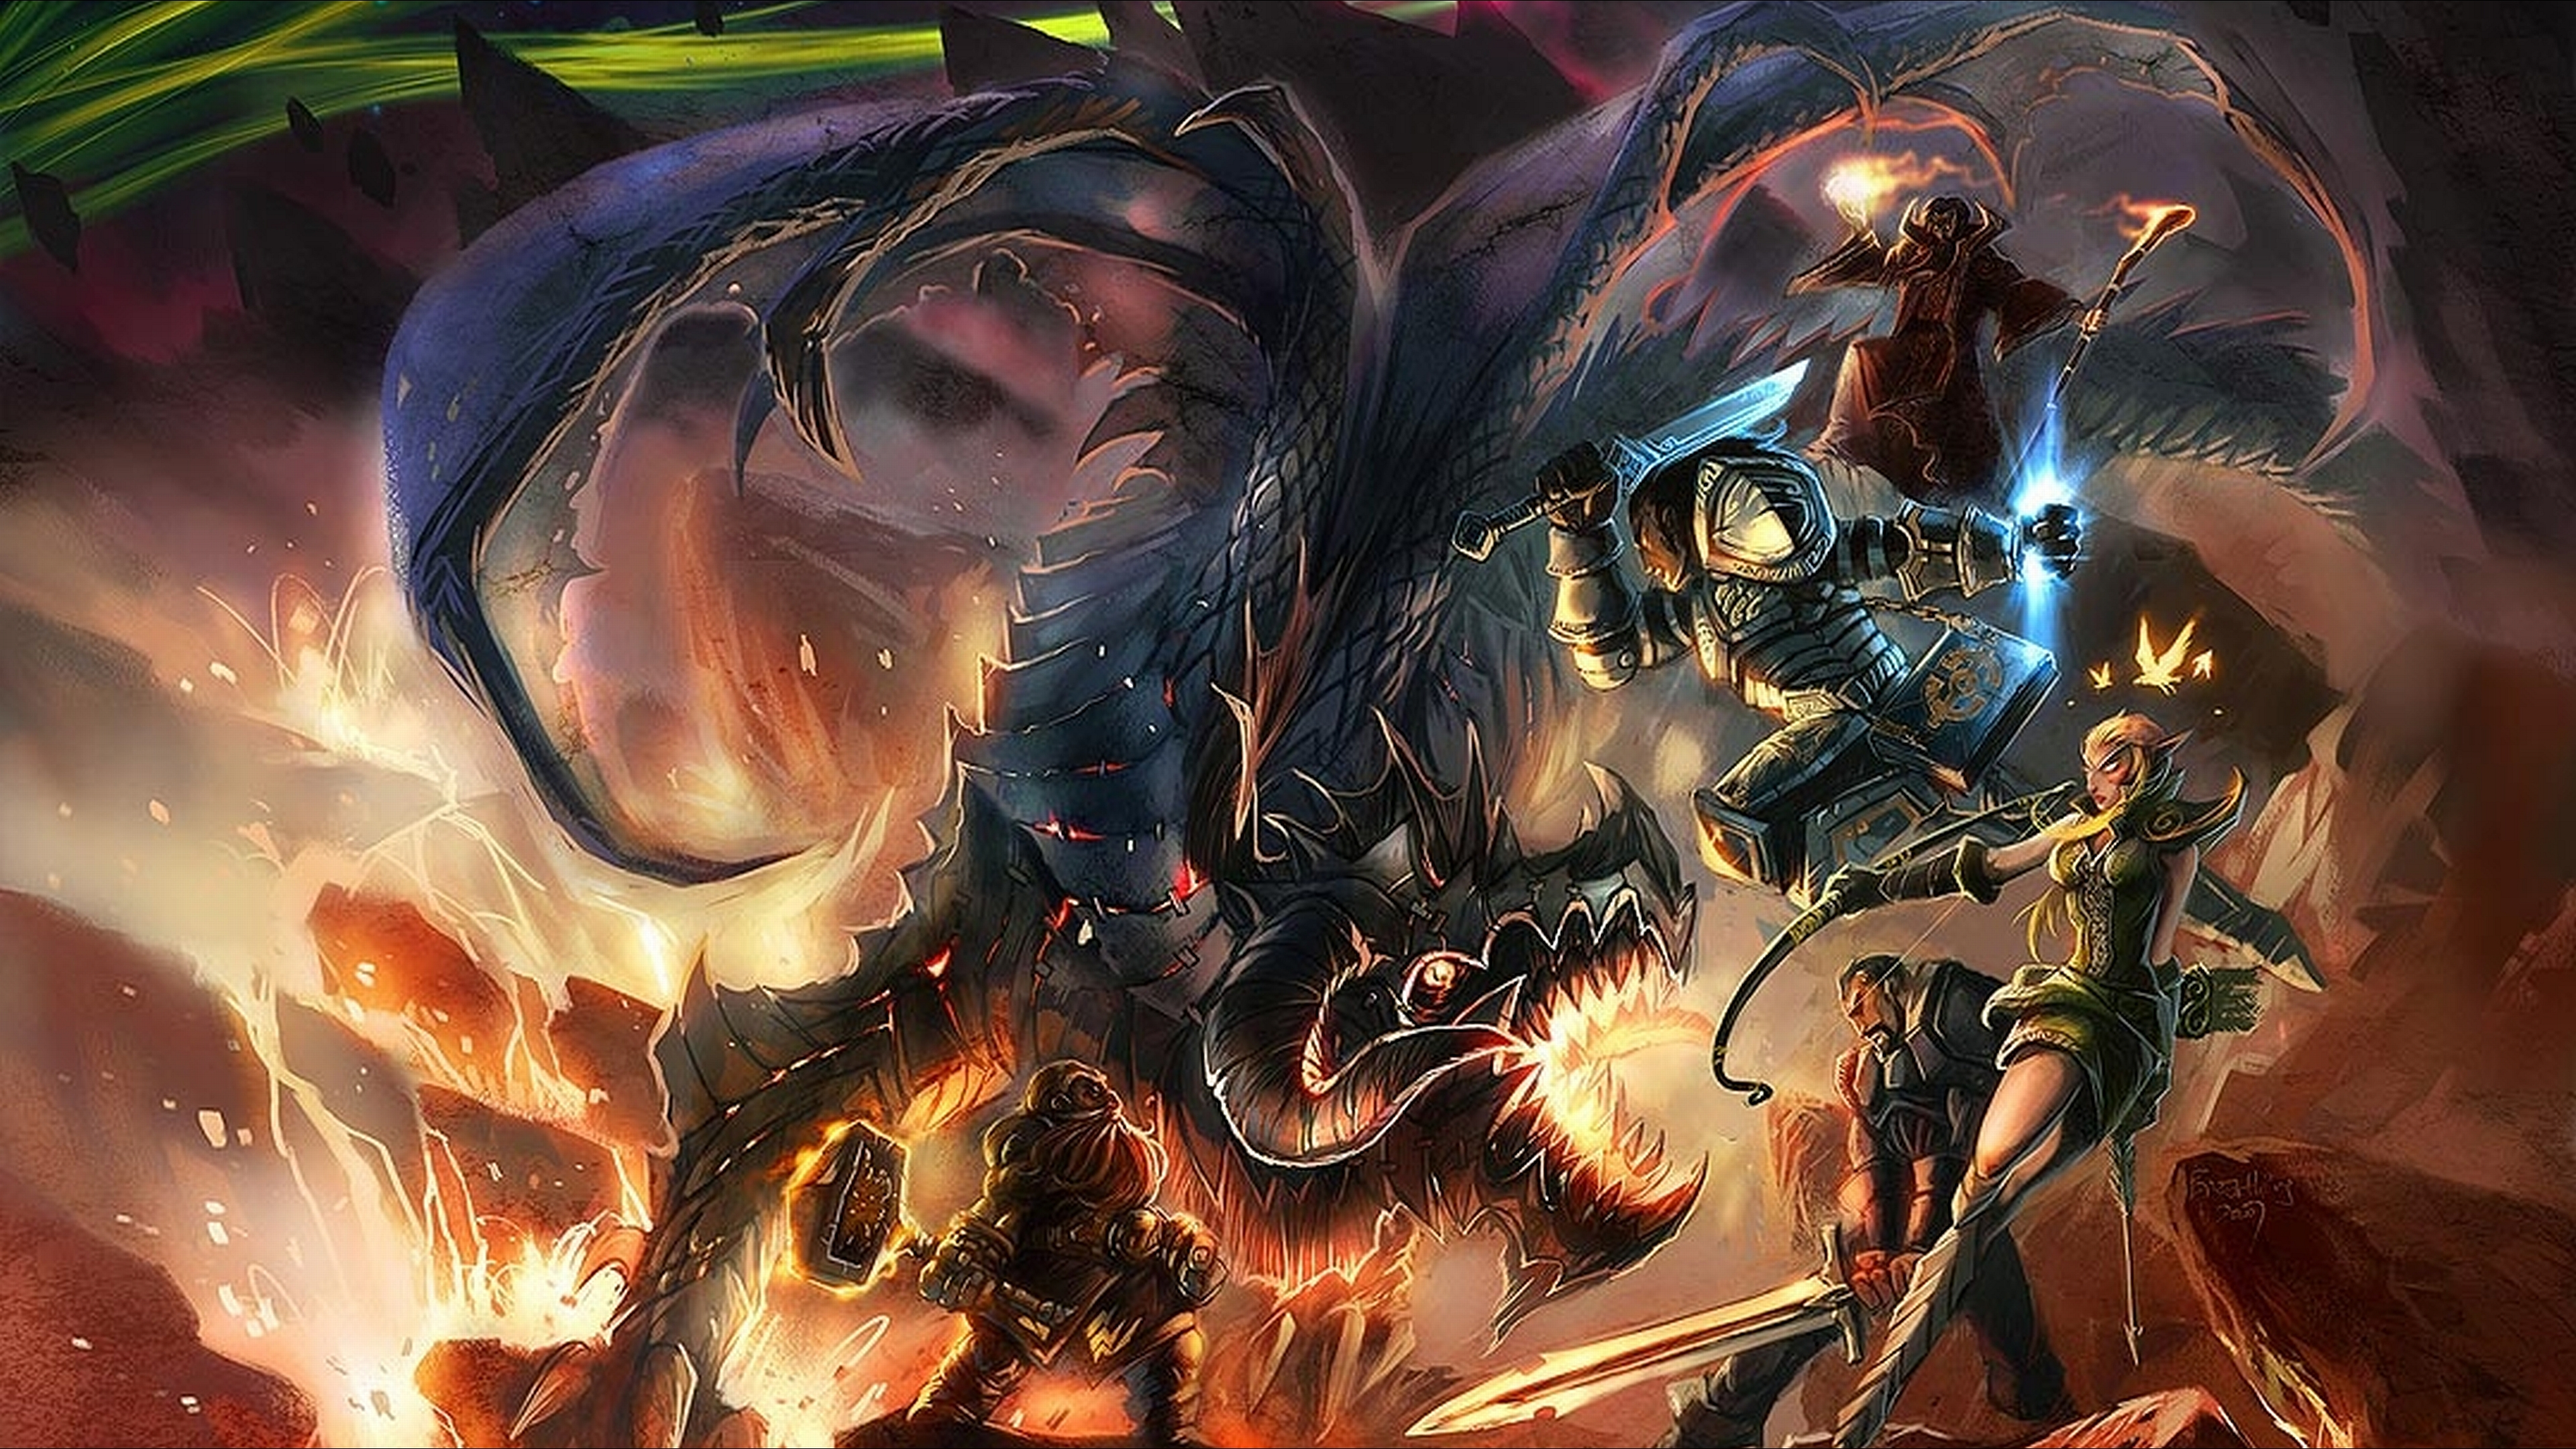 World Of Warcraft 4k Ultra HD Wallpaper